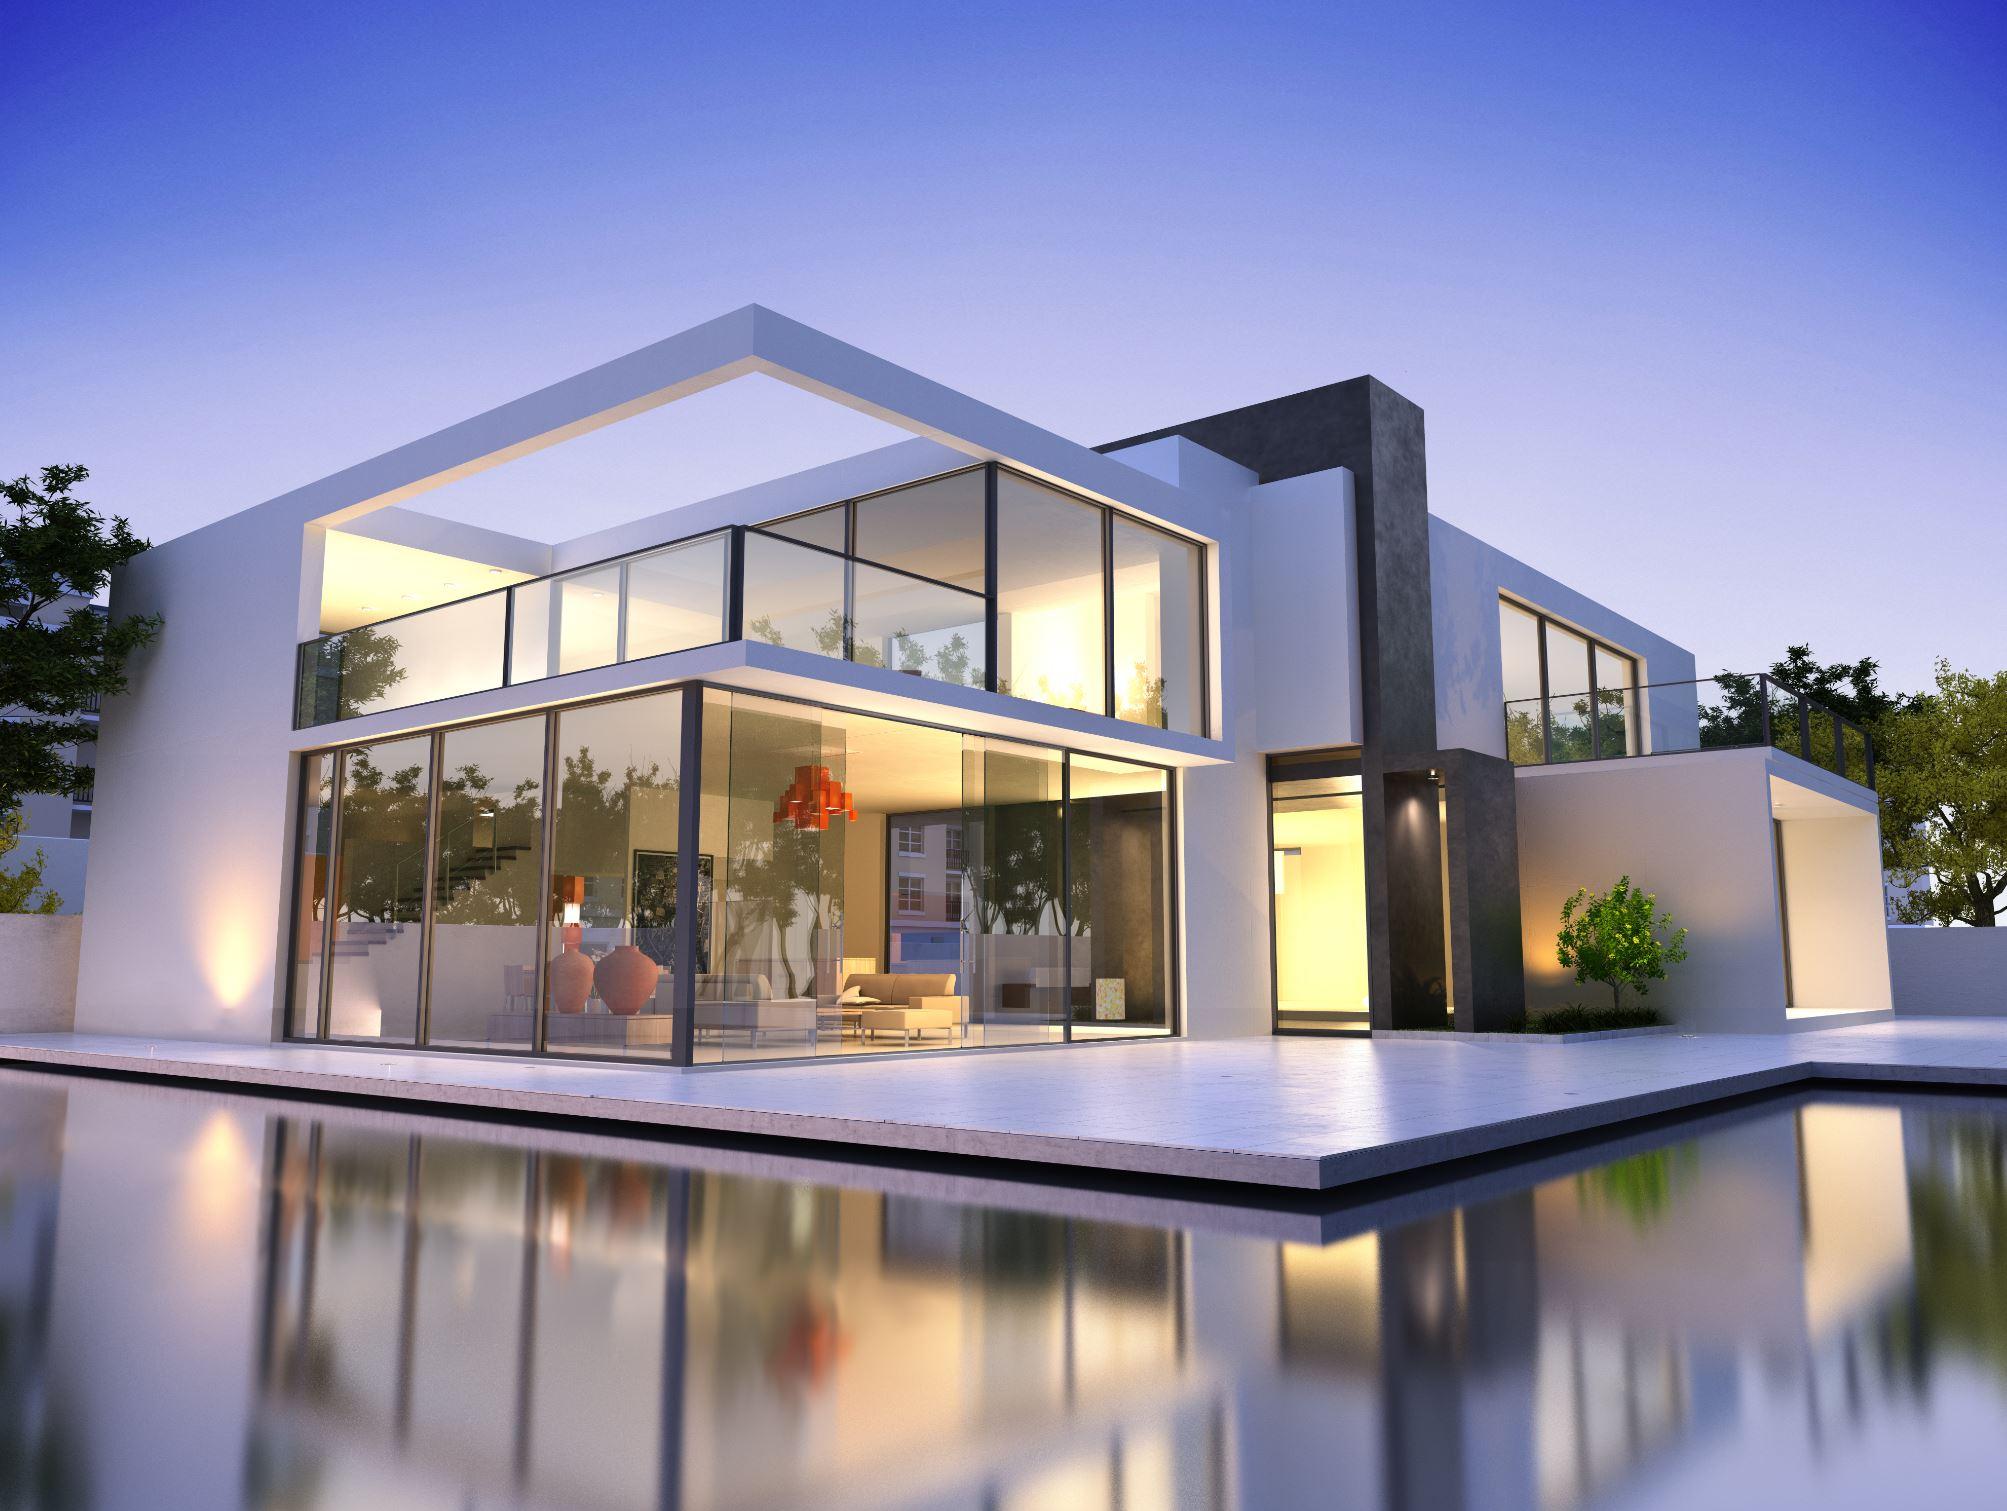 ArCADia BIM Architektur Software - 3D Rendering